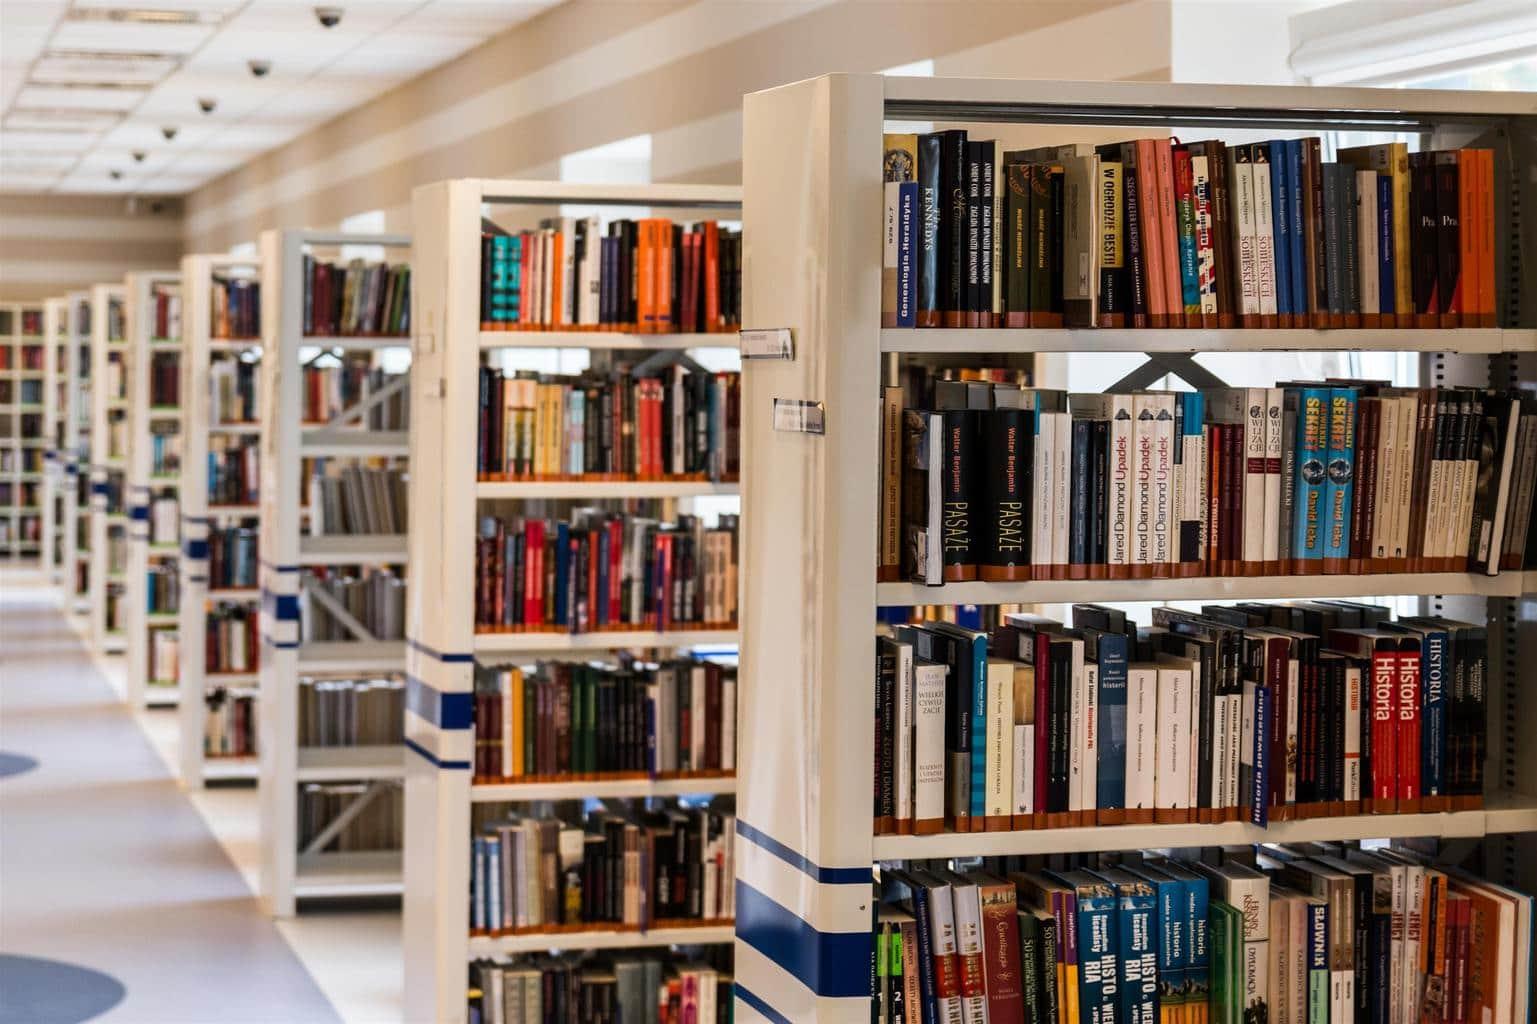 bookshelf-stock-photo